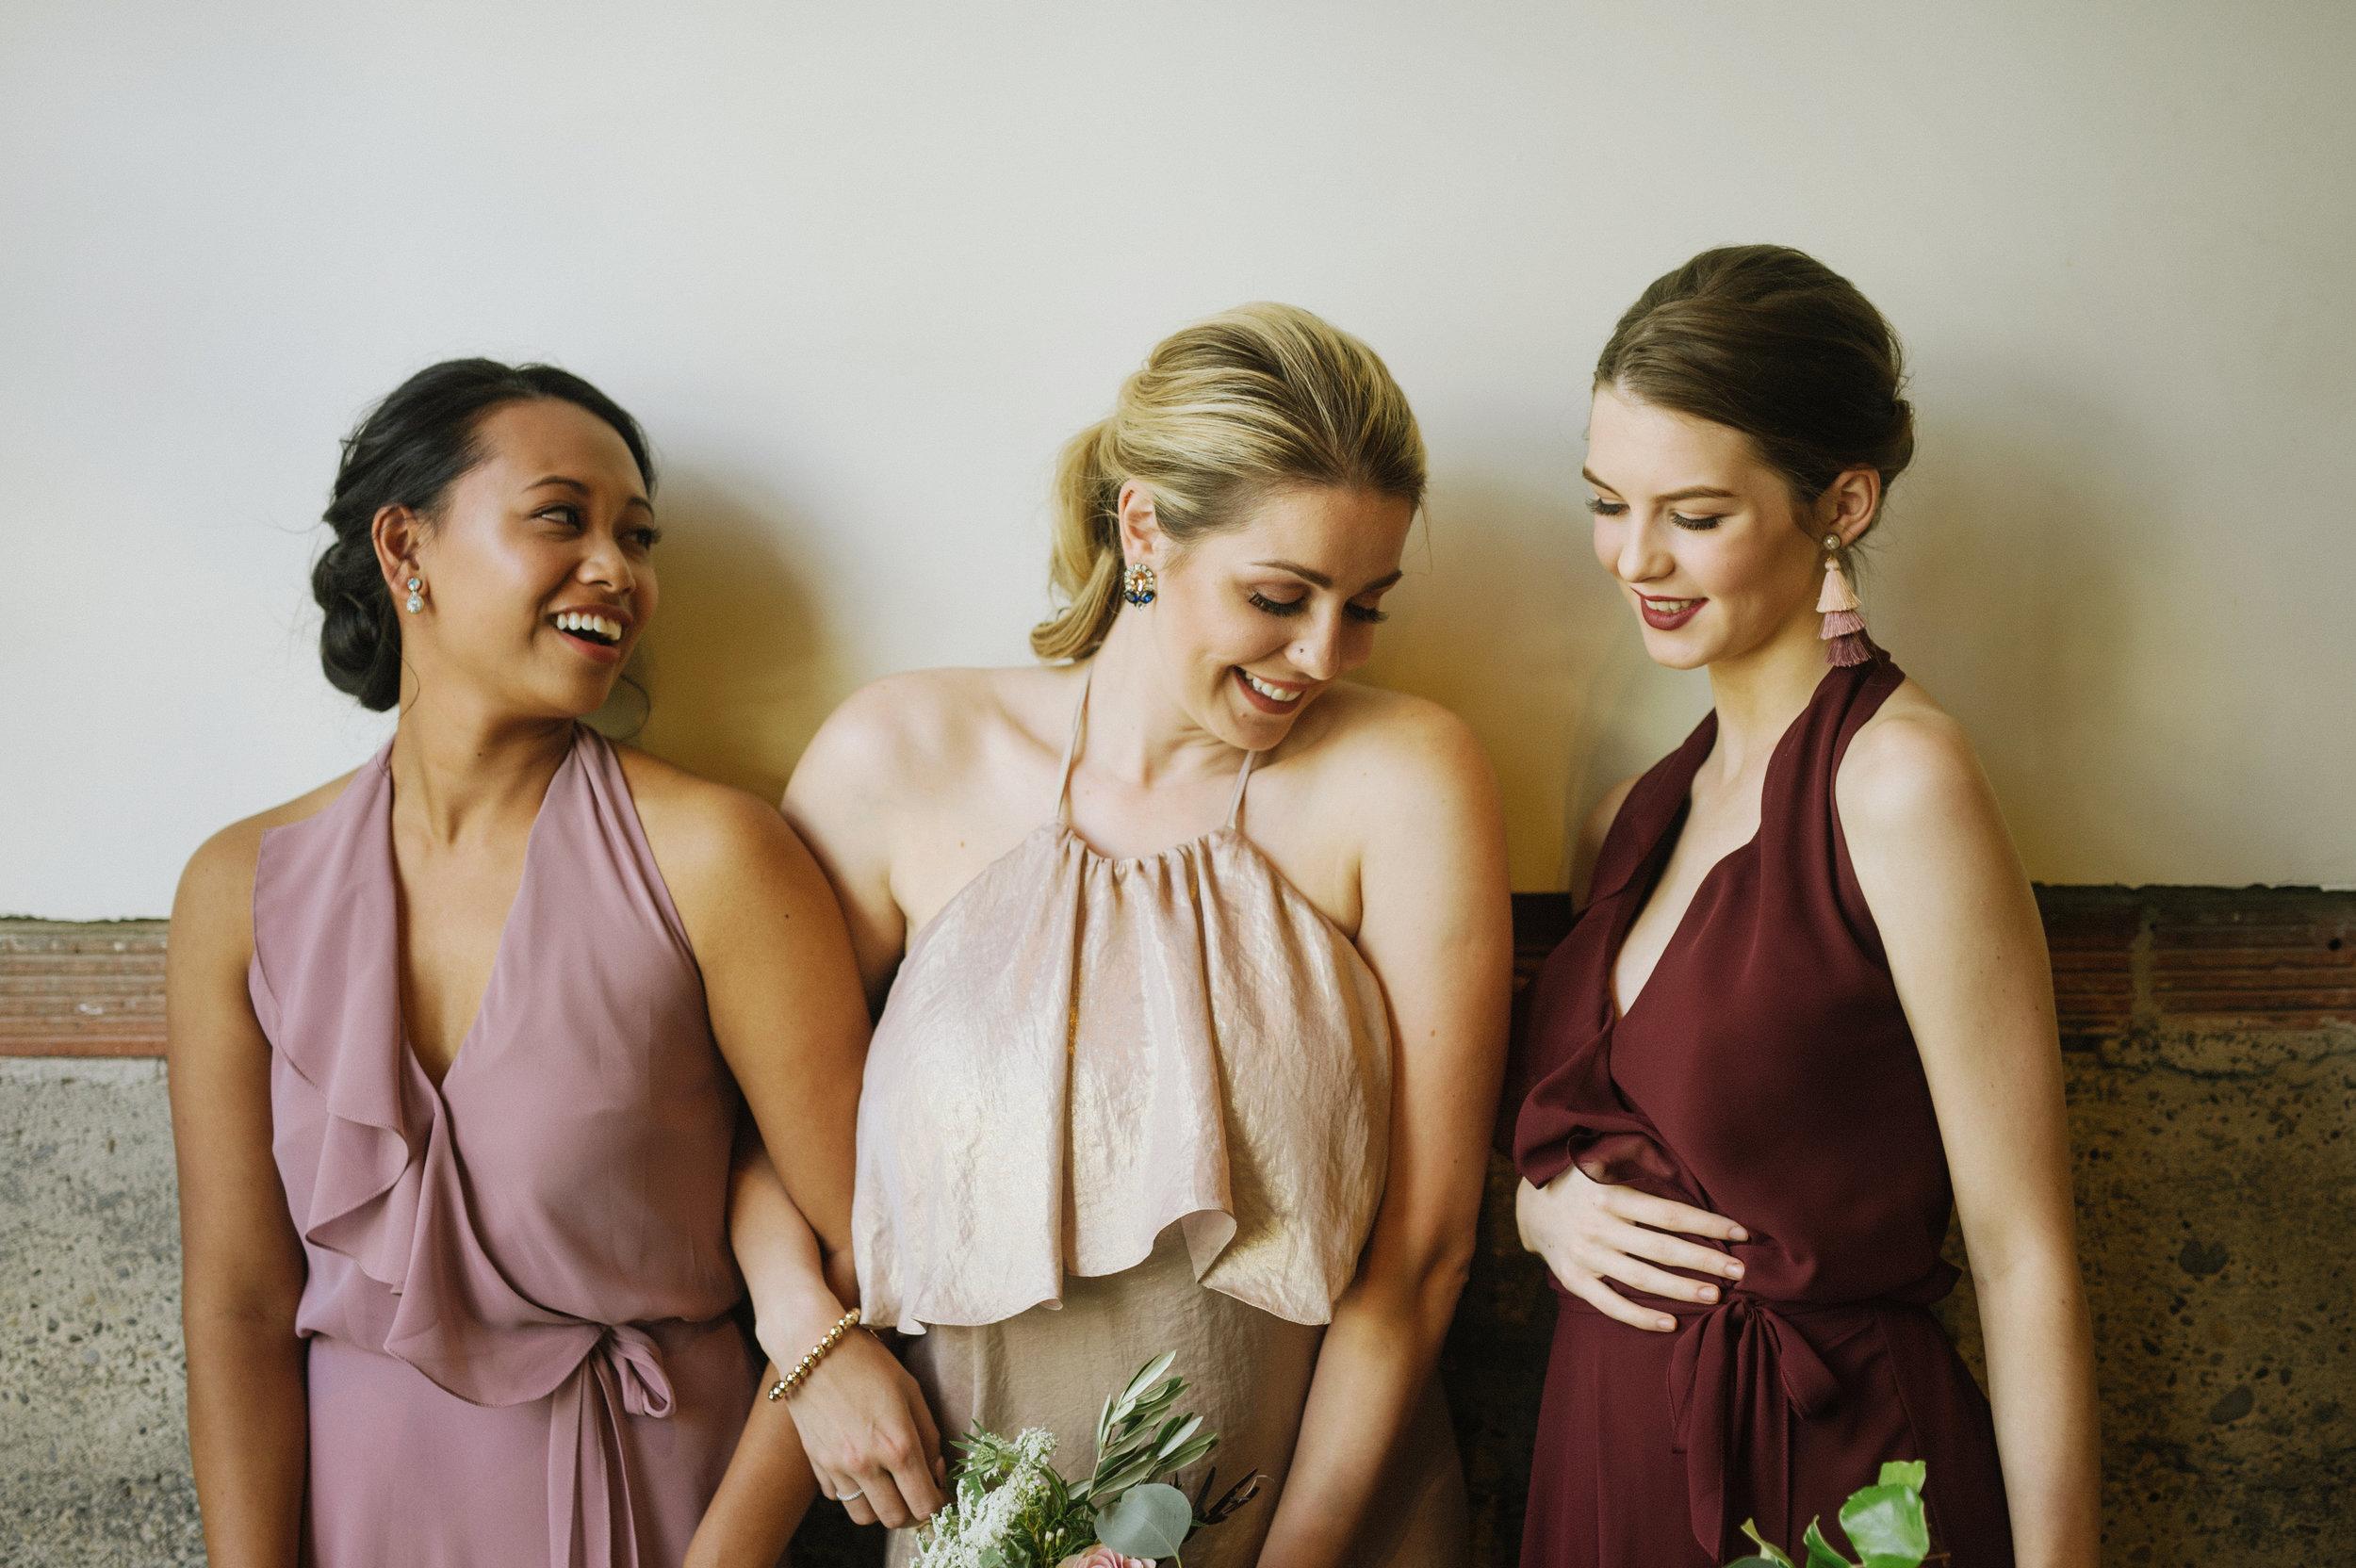 Calgary_Wedding_Photography_Bridgette_Bar_Bridesmaids_Shoot_2018_HR082.jpg